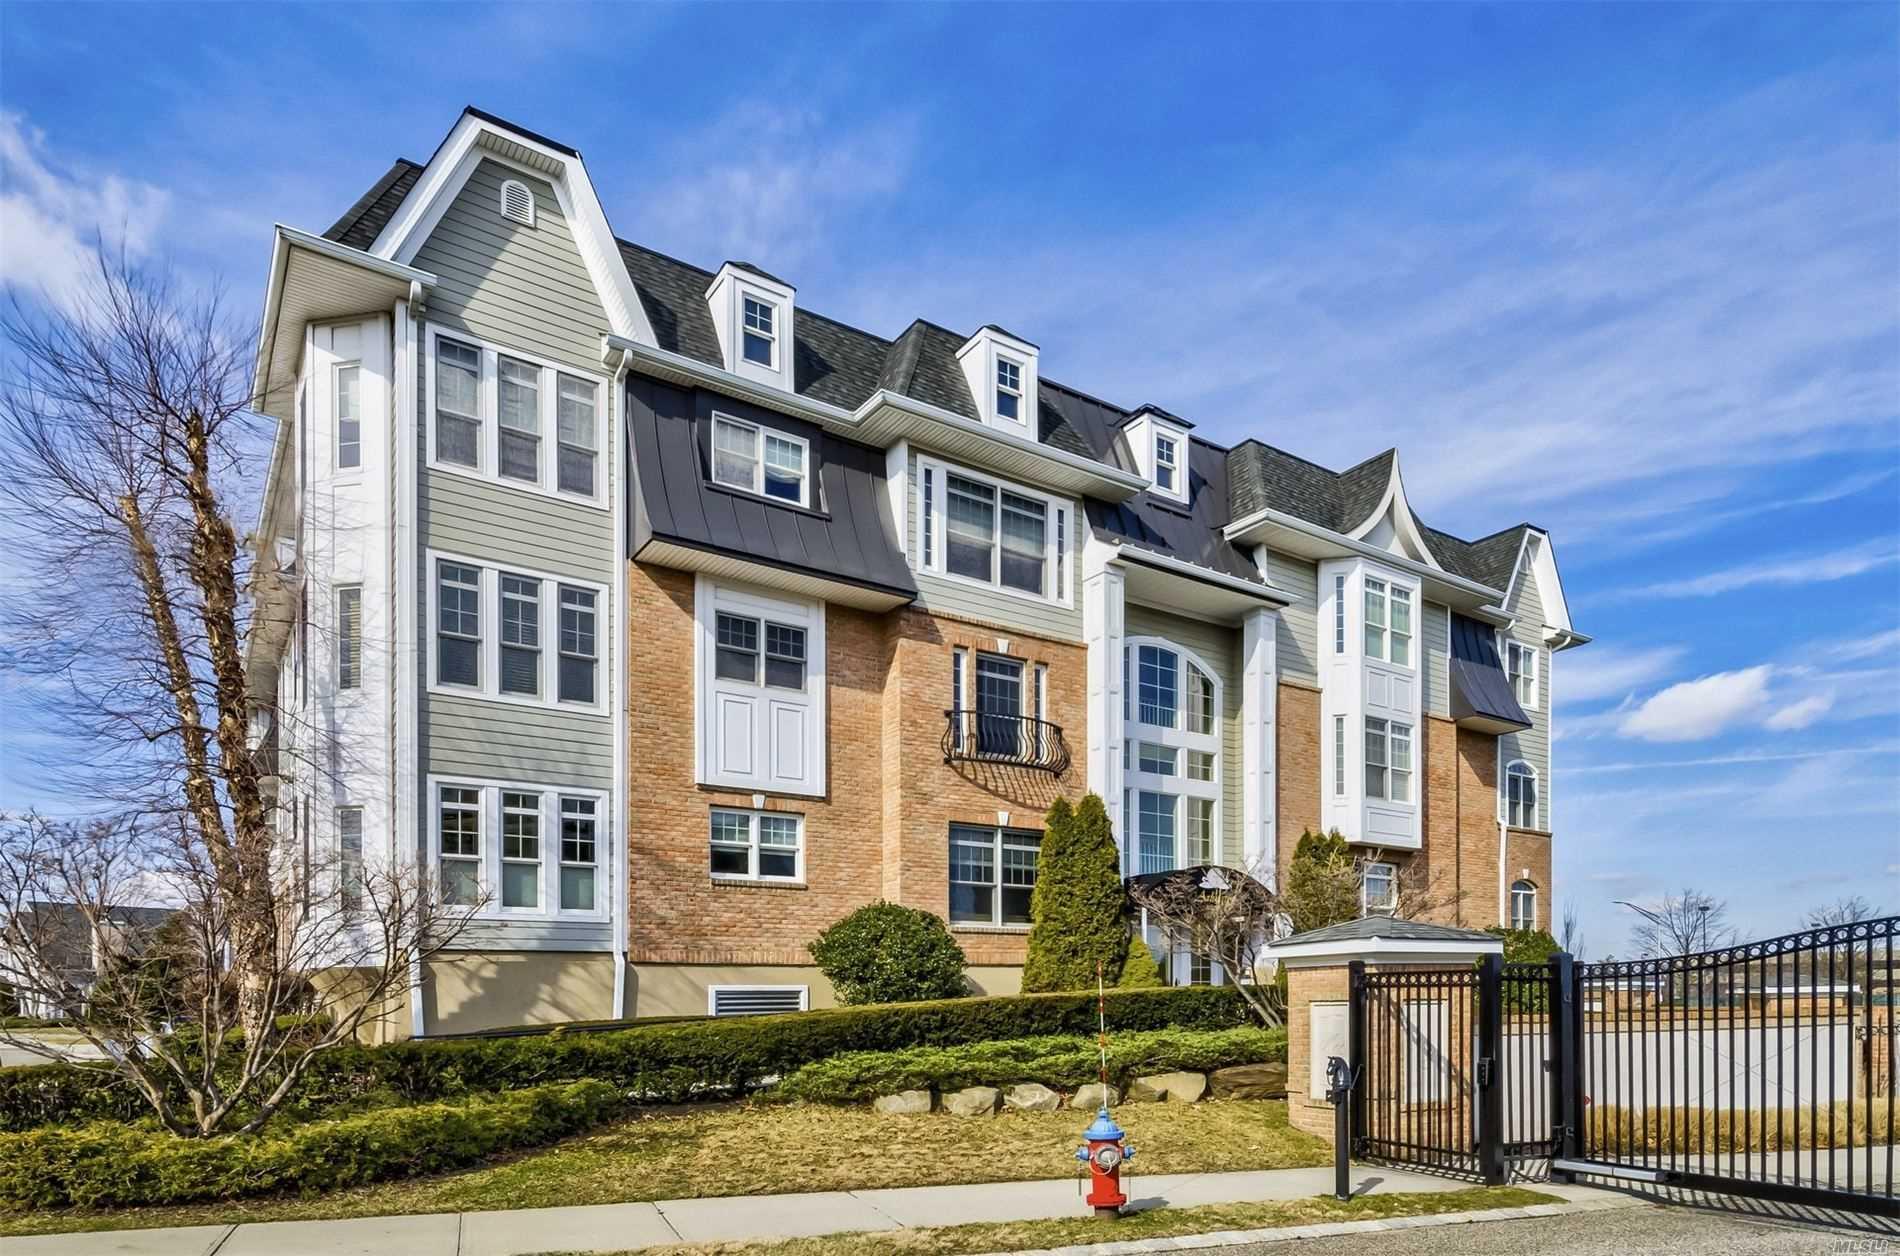 Property for sale at 129 Roosevelt Way, Westbury NY 11590, Westbury,  New York 11590